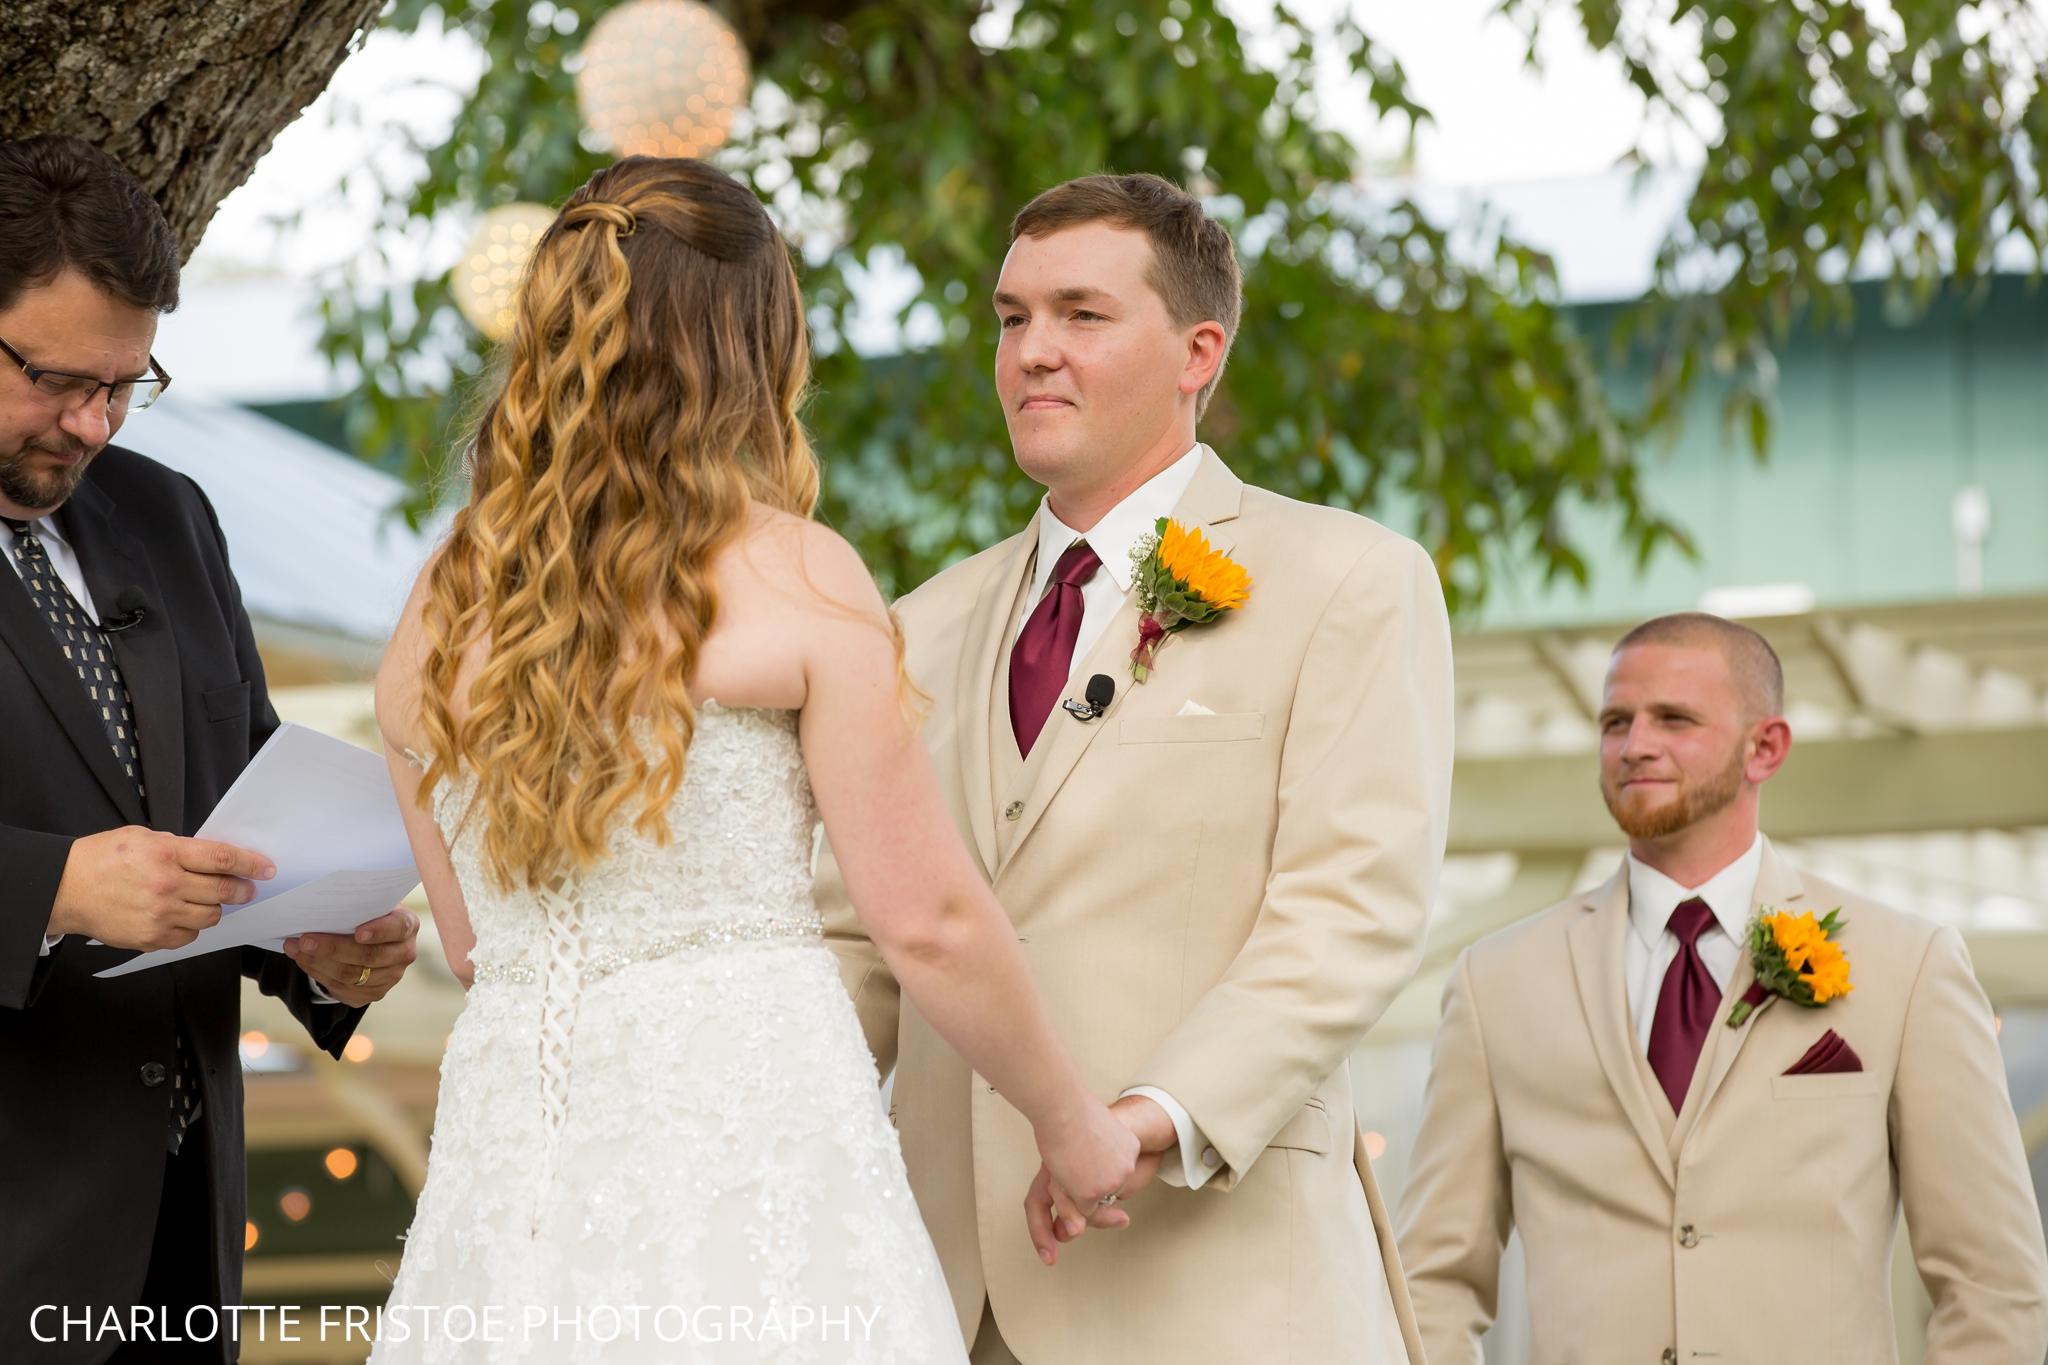 Tallahassee_Wedding_Charlotte_Fristoe-38.jpg